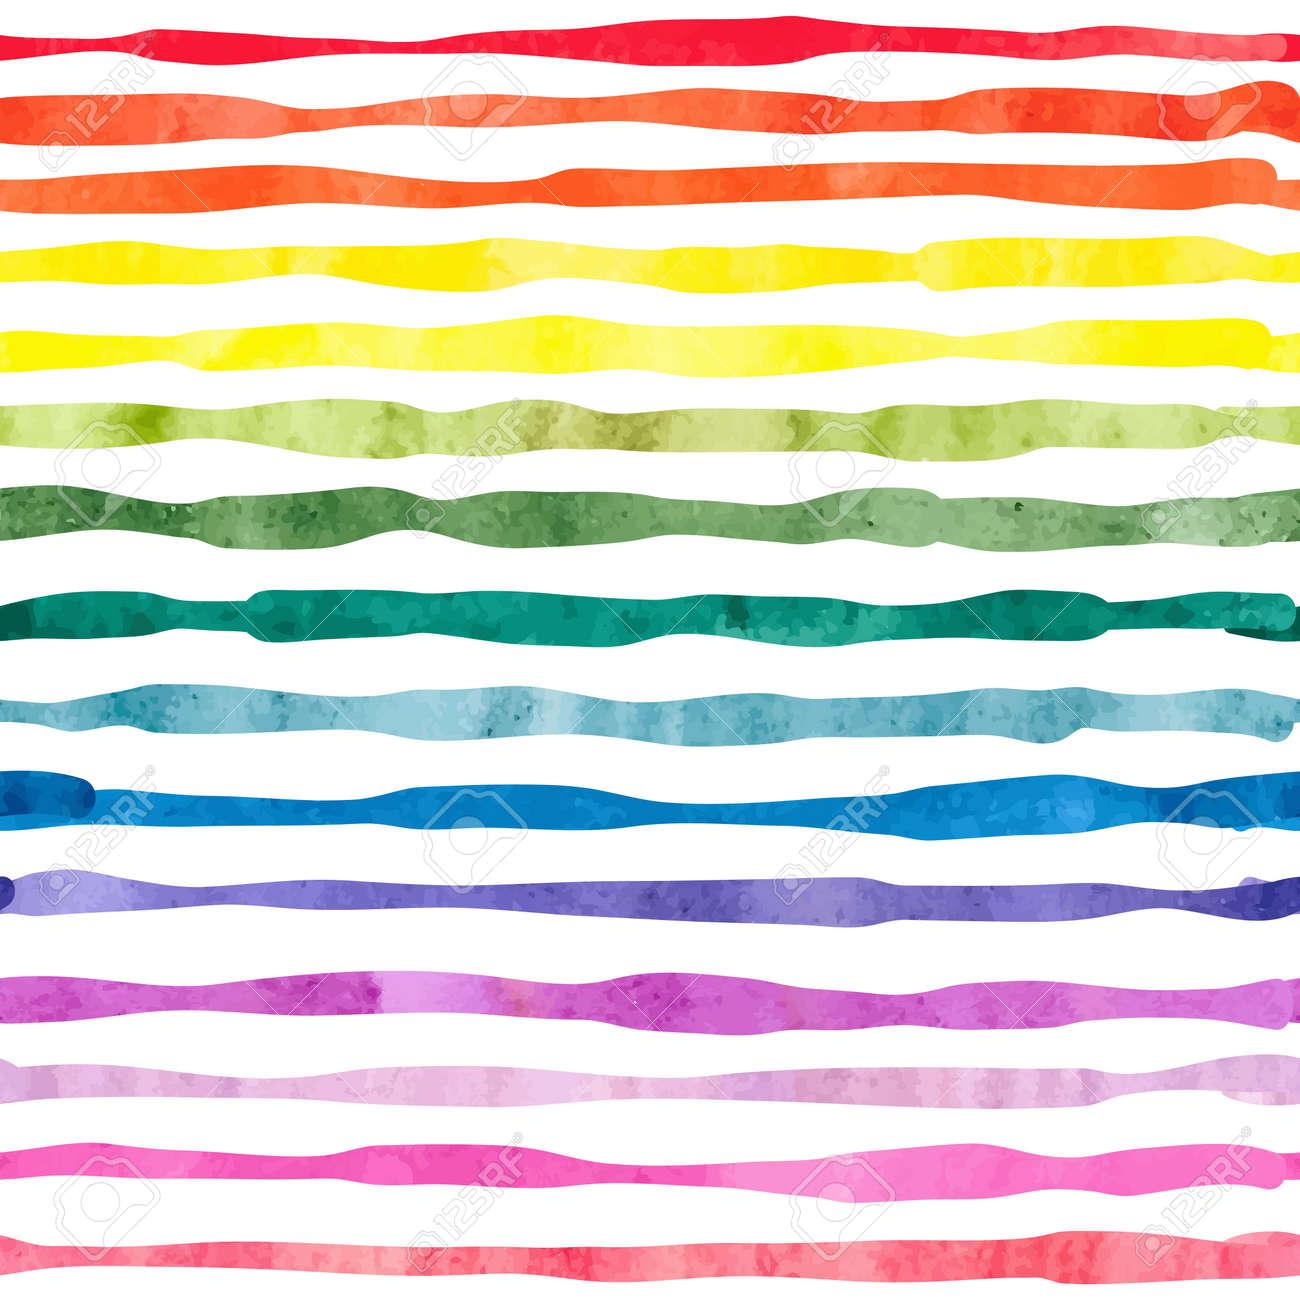 Fondos de rayas de colores horizontales